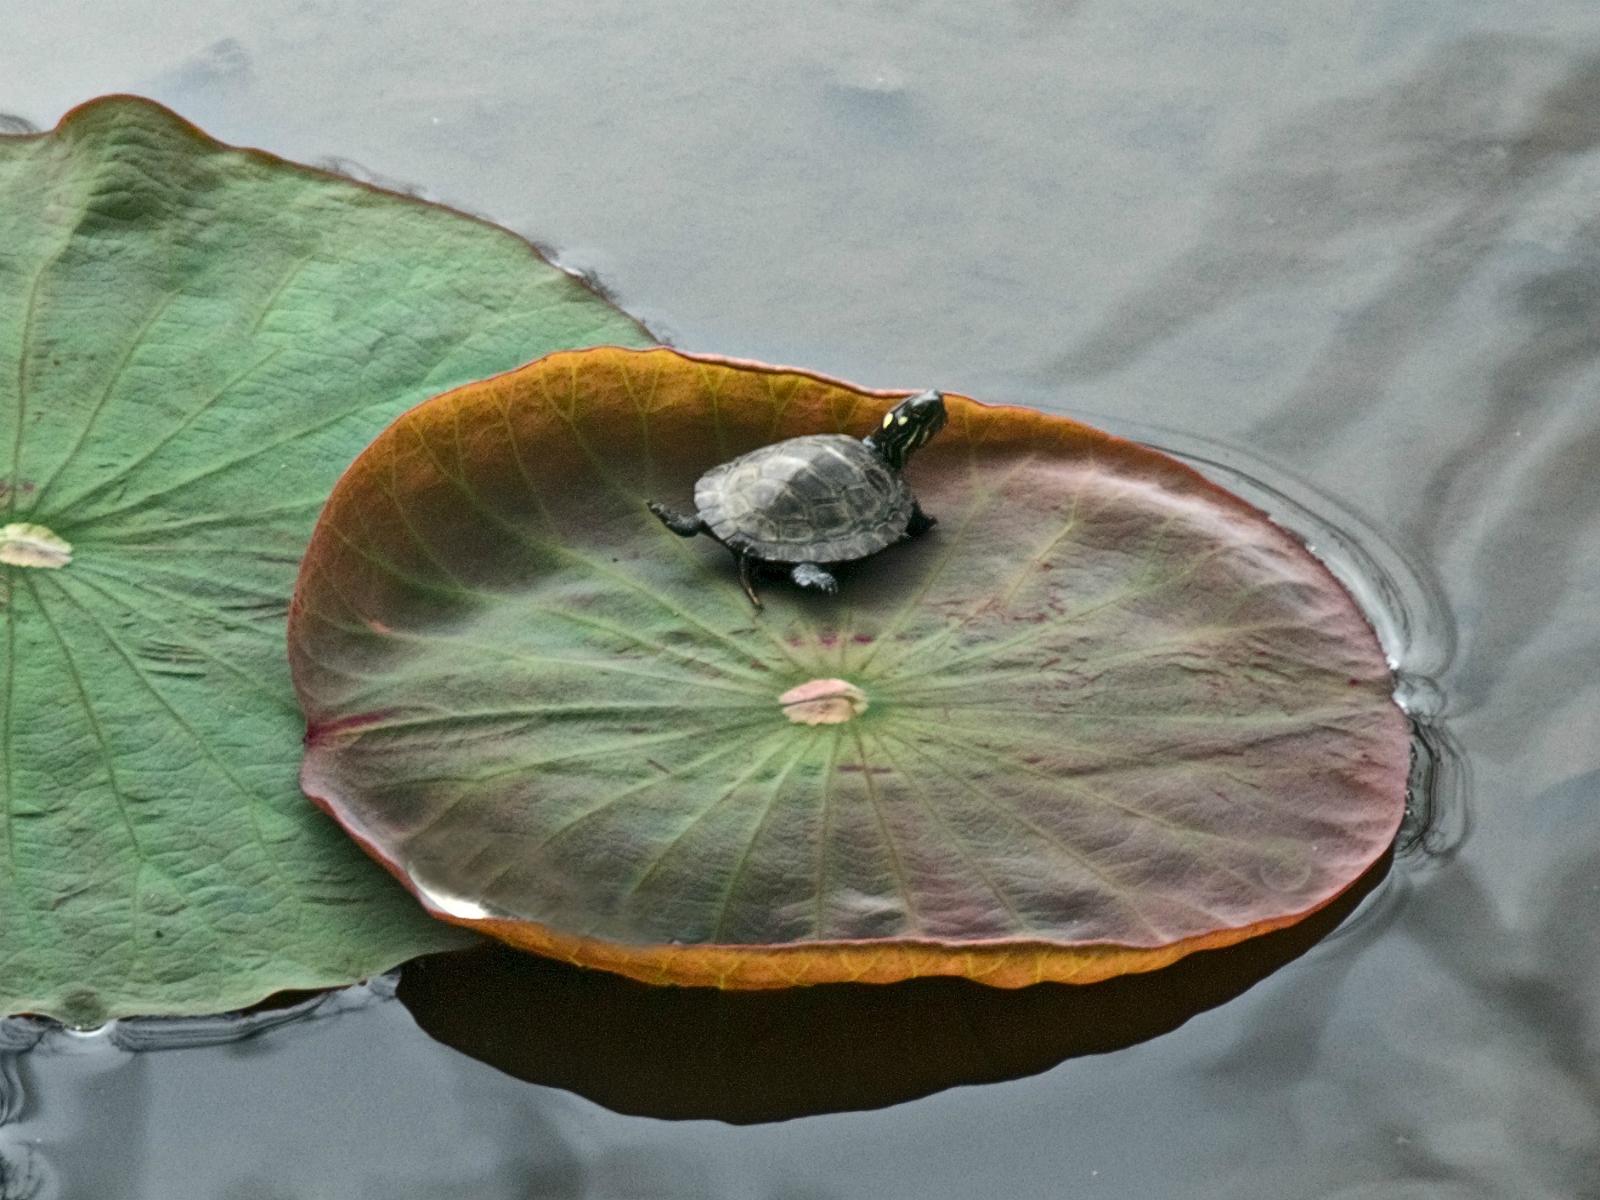 http://3.bp.blogspot.com/-9tBbt4Yi_7c/TmppWplTsqI/AAAAAAAAA3I/LXF-R-ZA3tE/s1600/nature_lilly_turtles_www.Vvallpaper.net.jpg